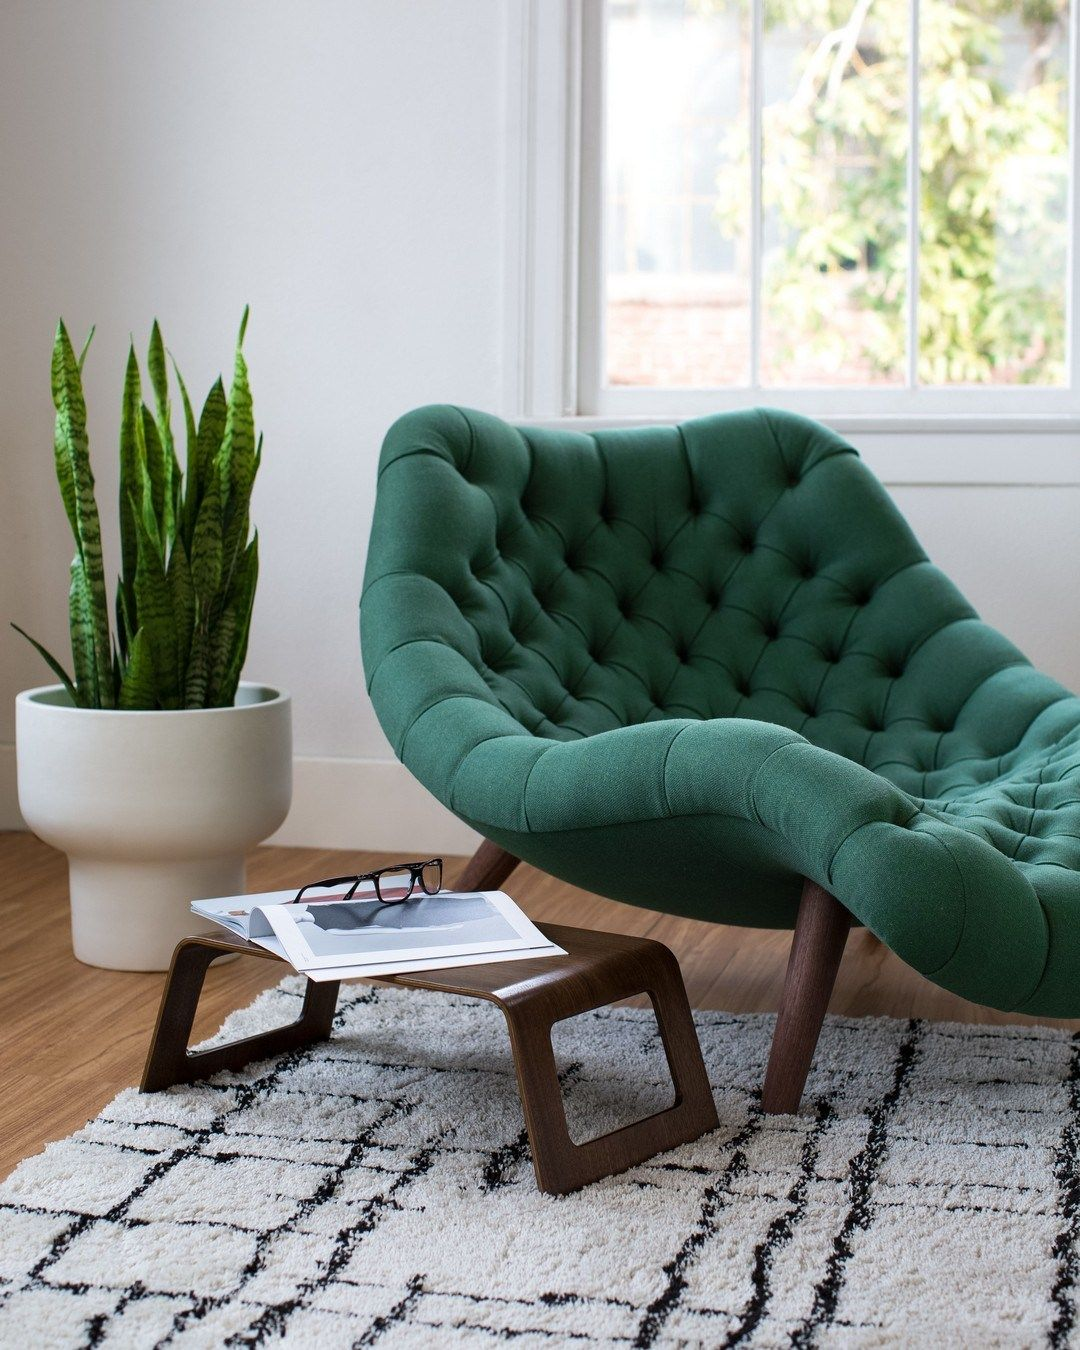 55 Modern Apartment Interior Design With Stylish Furniture